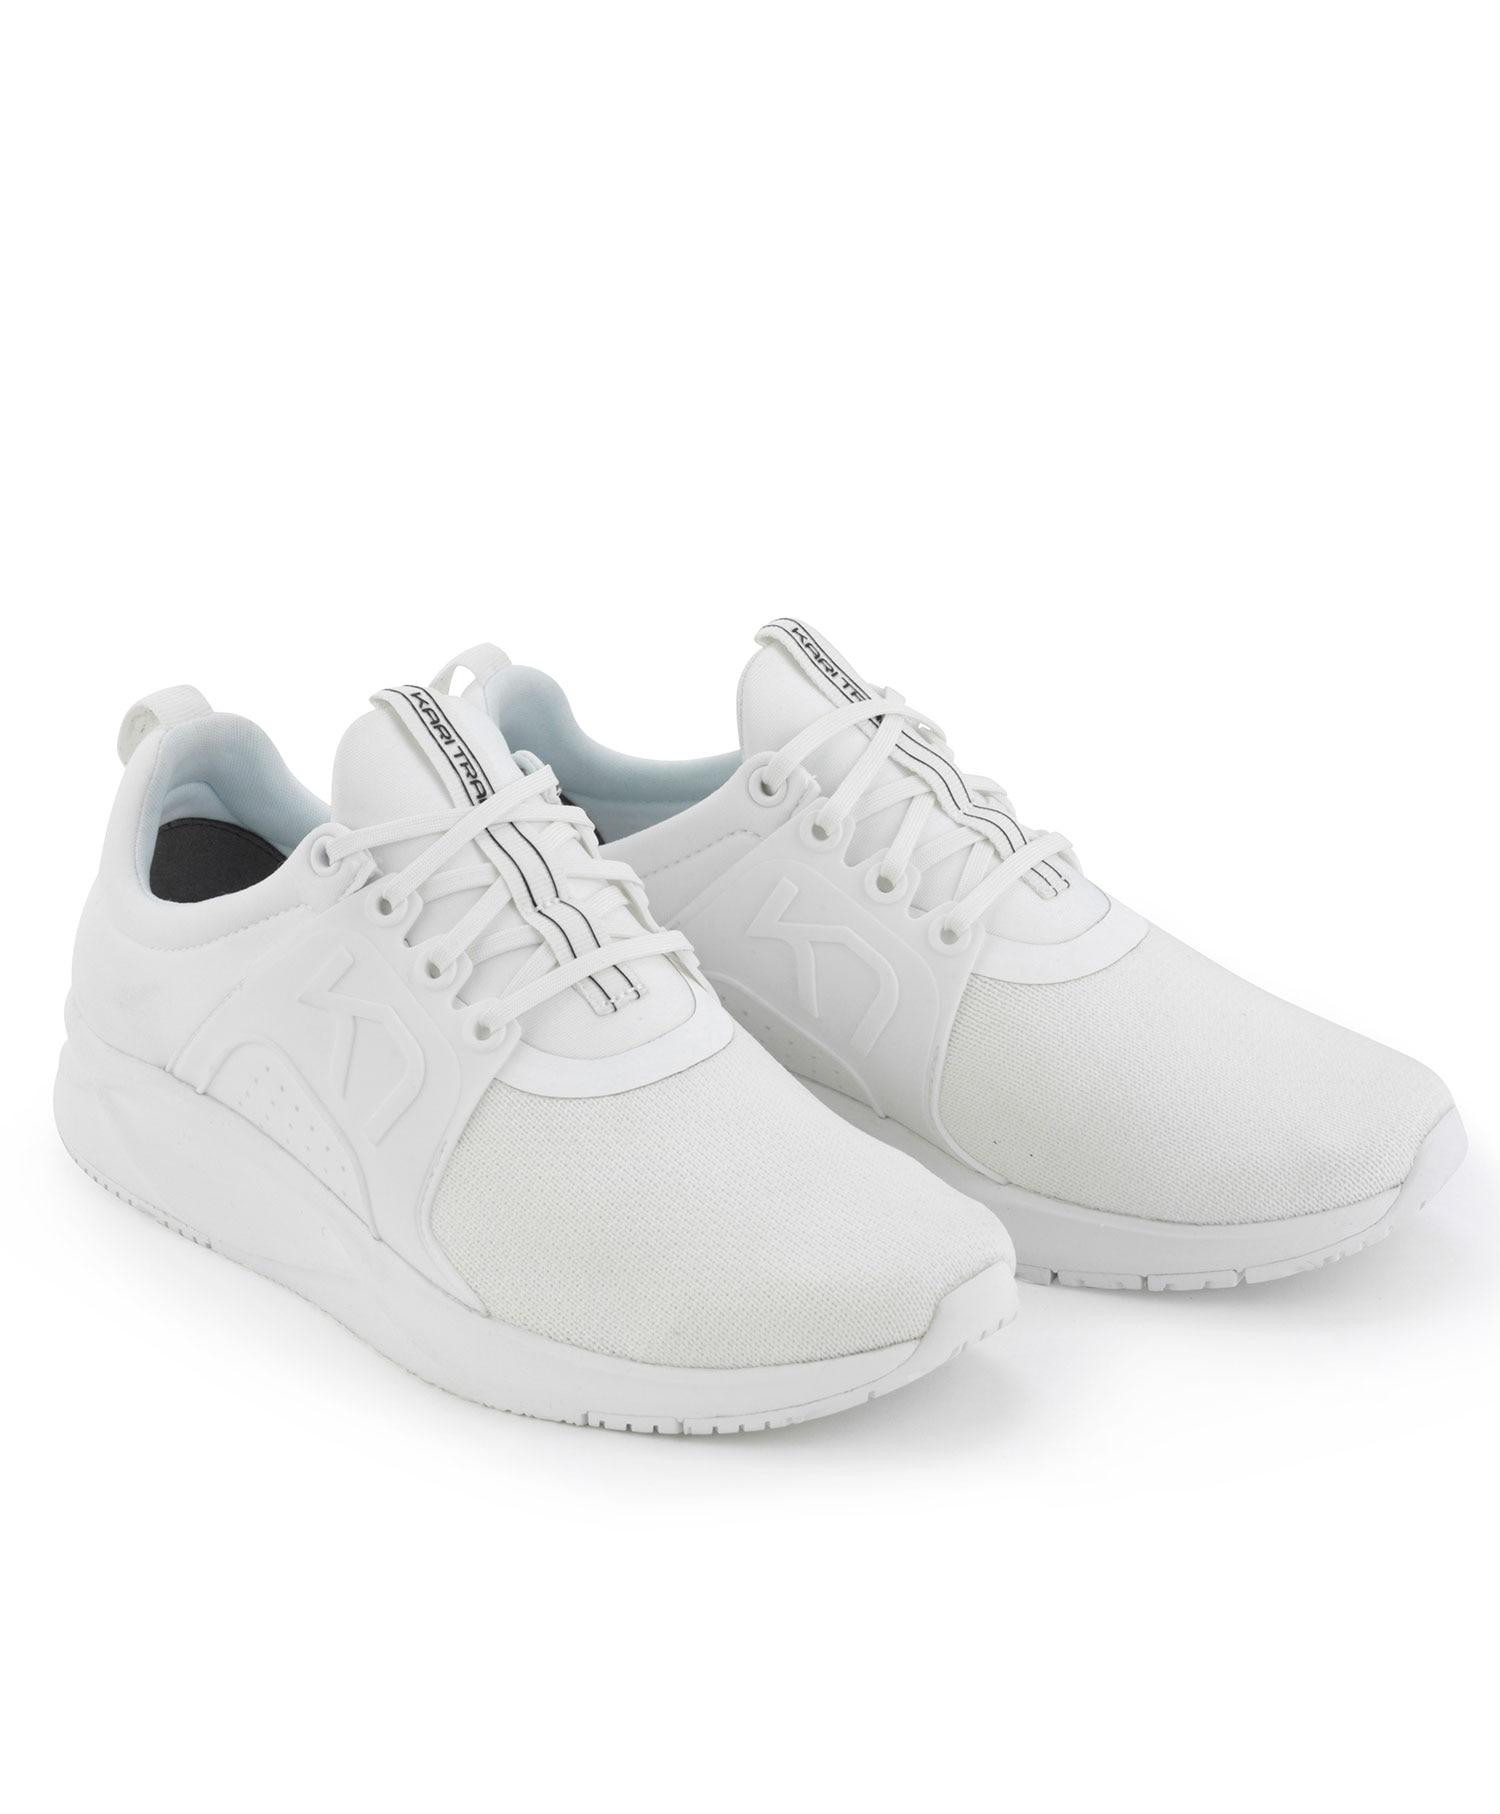 Kari Traa Fres sneakers